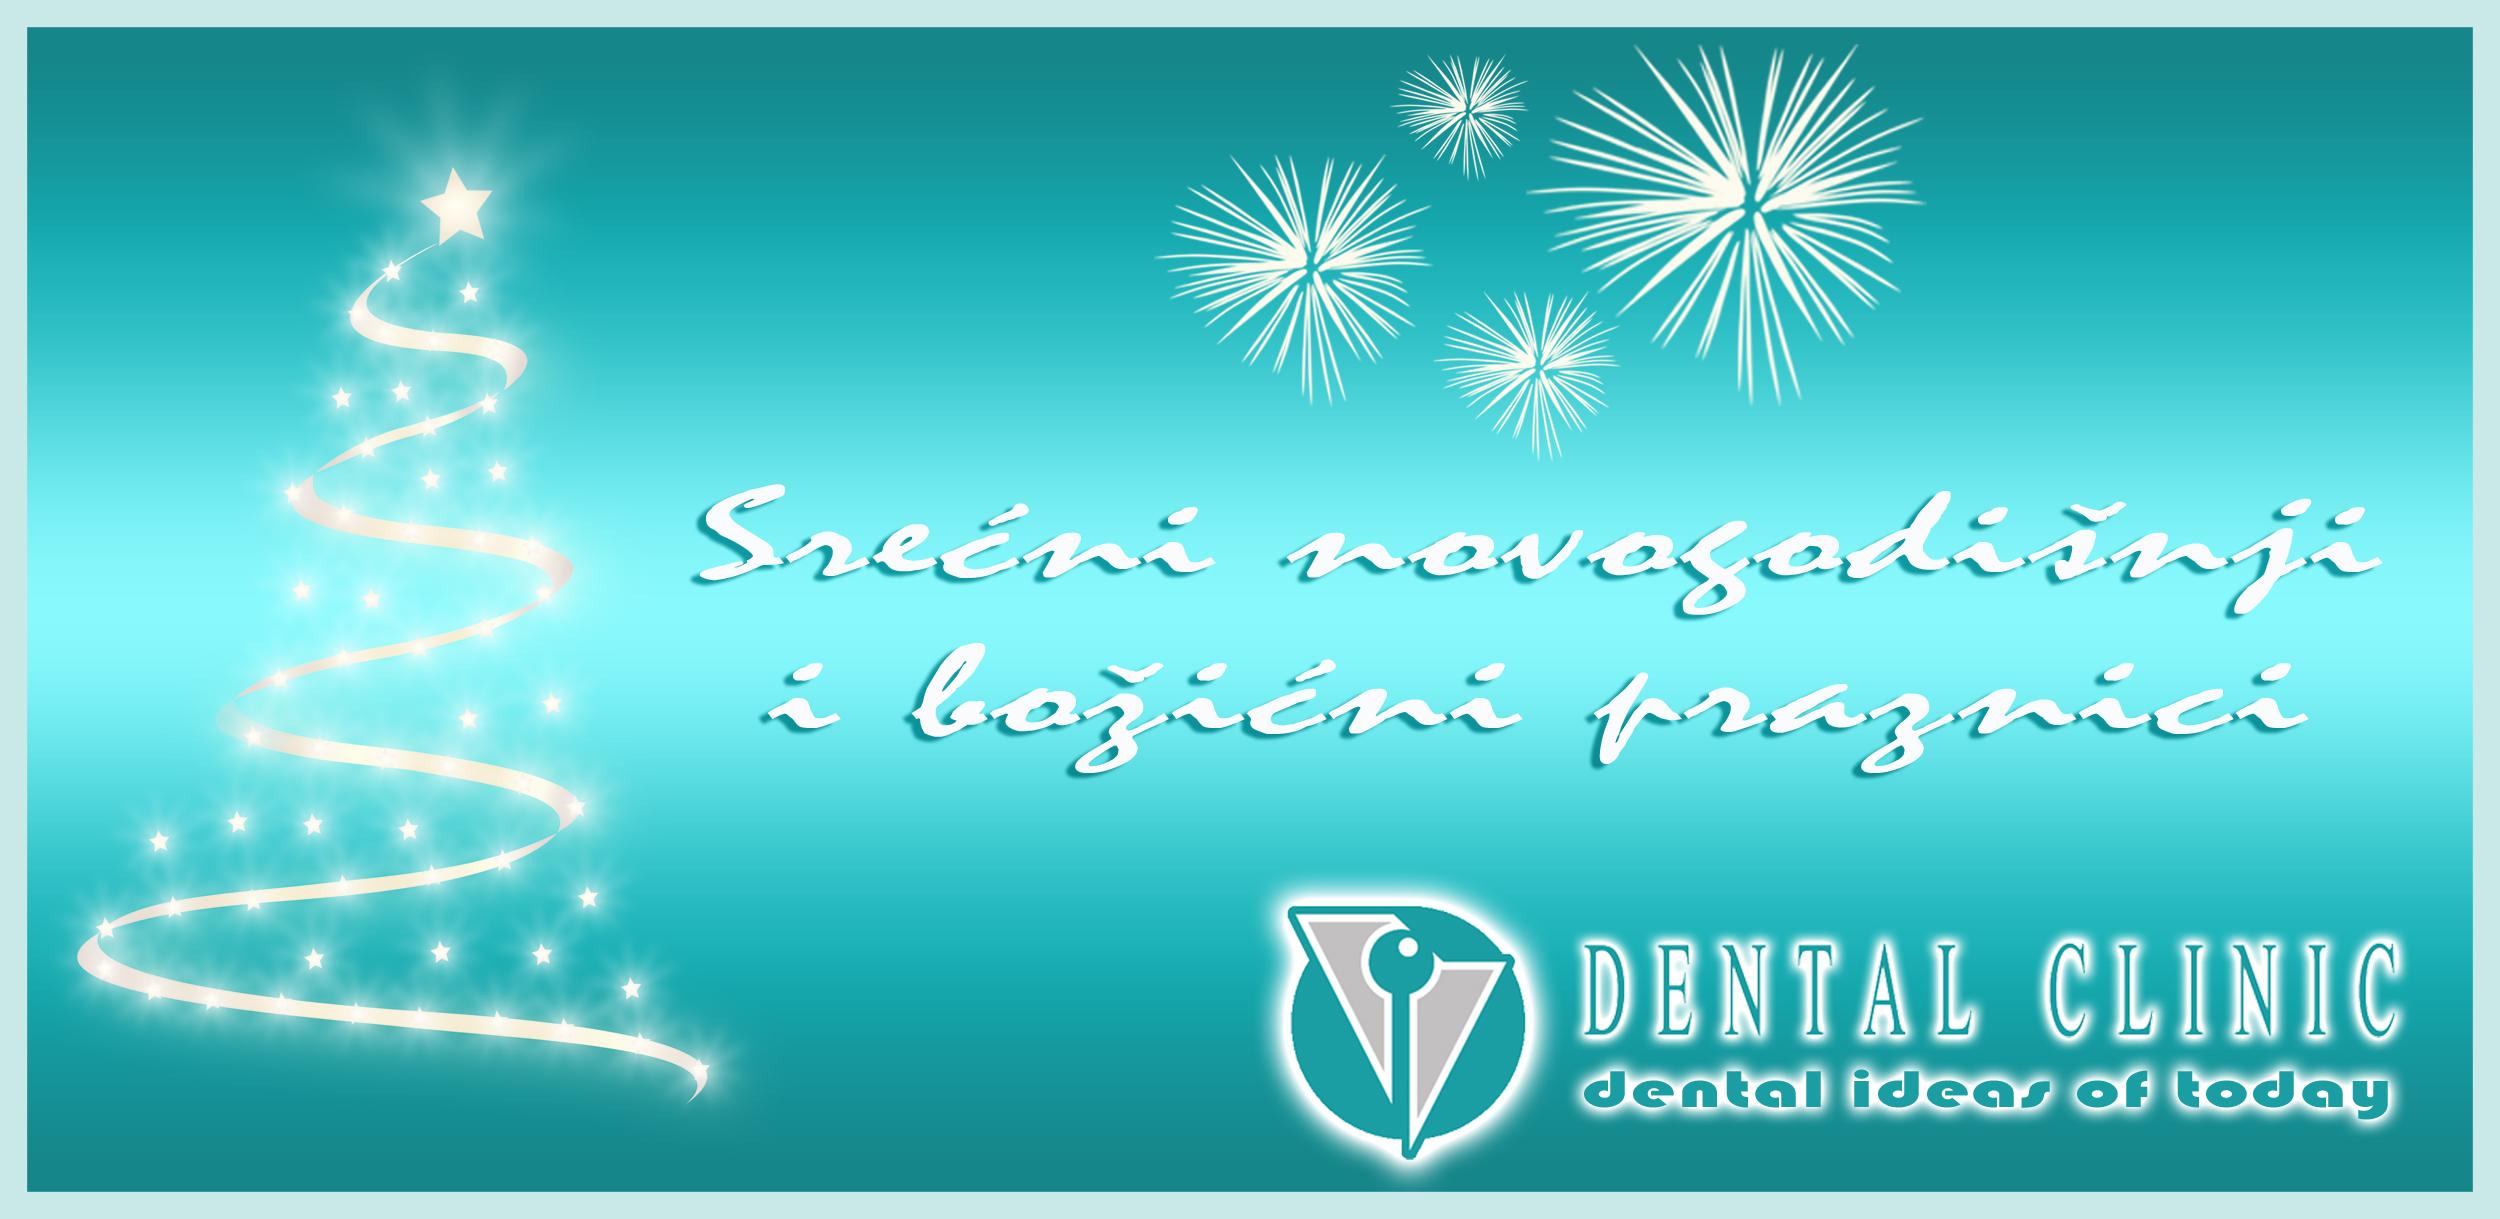 Dental Clinic_Cestitka